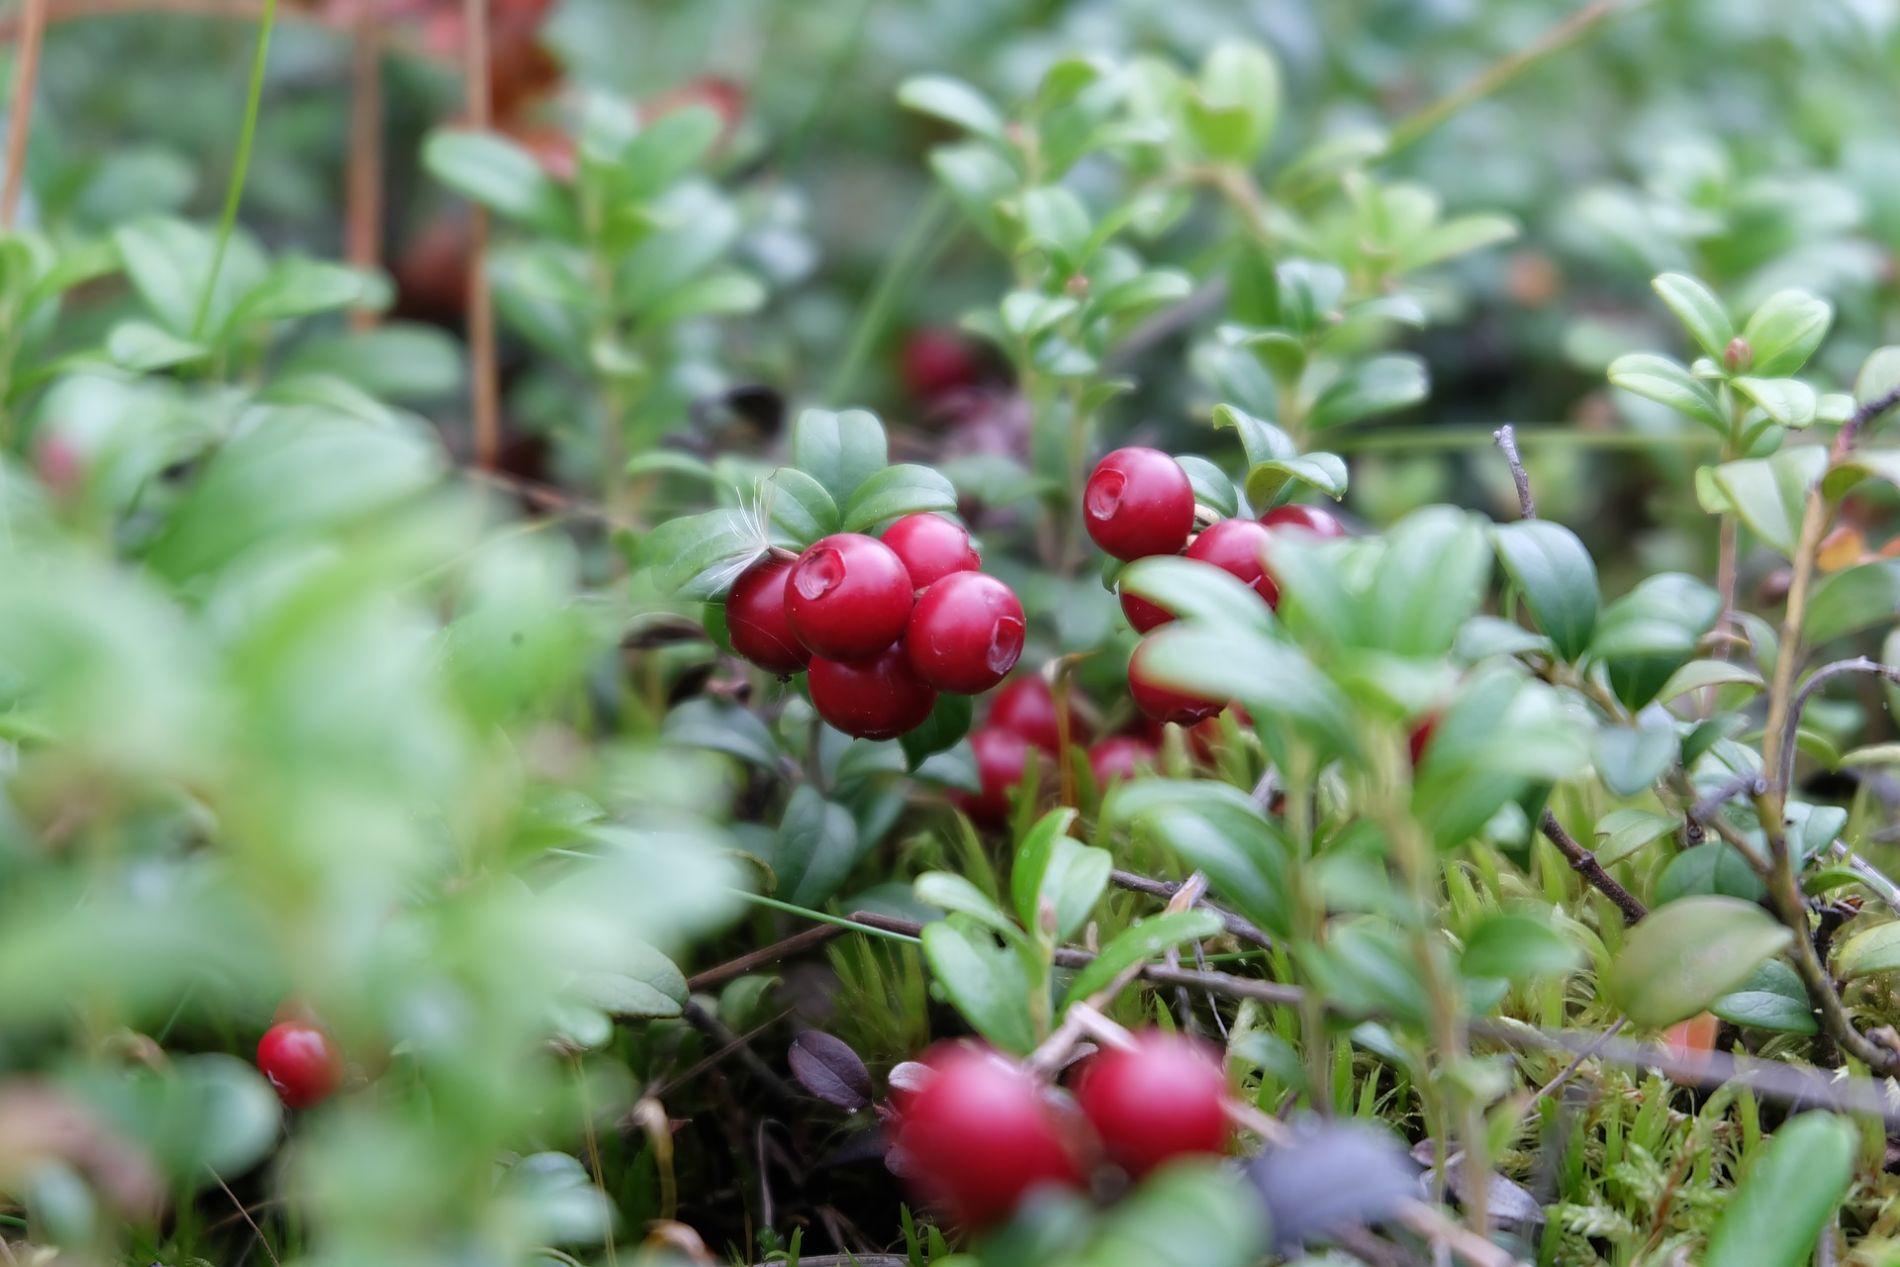 Frutos silvestres de arándano rojo